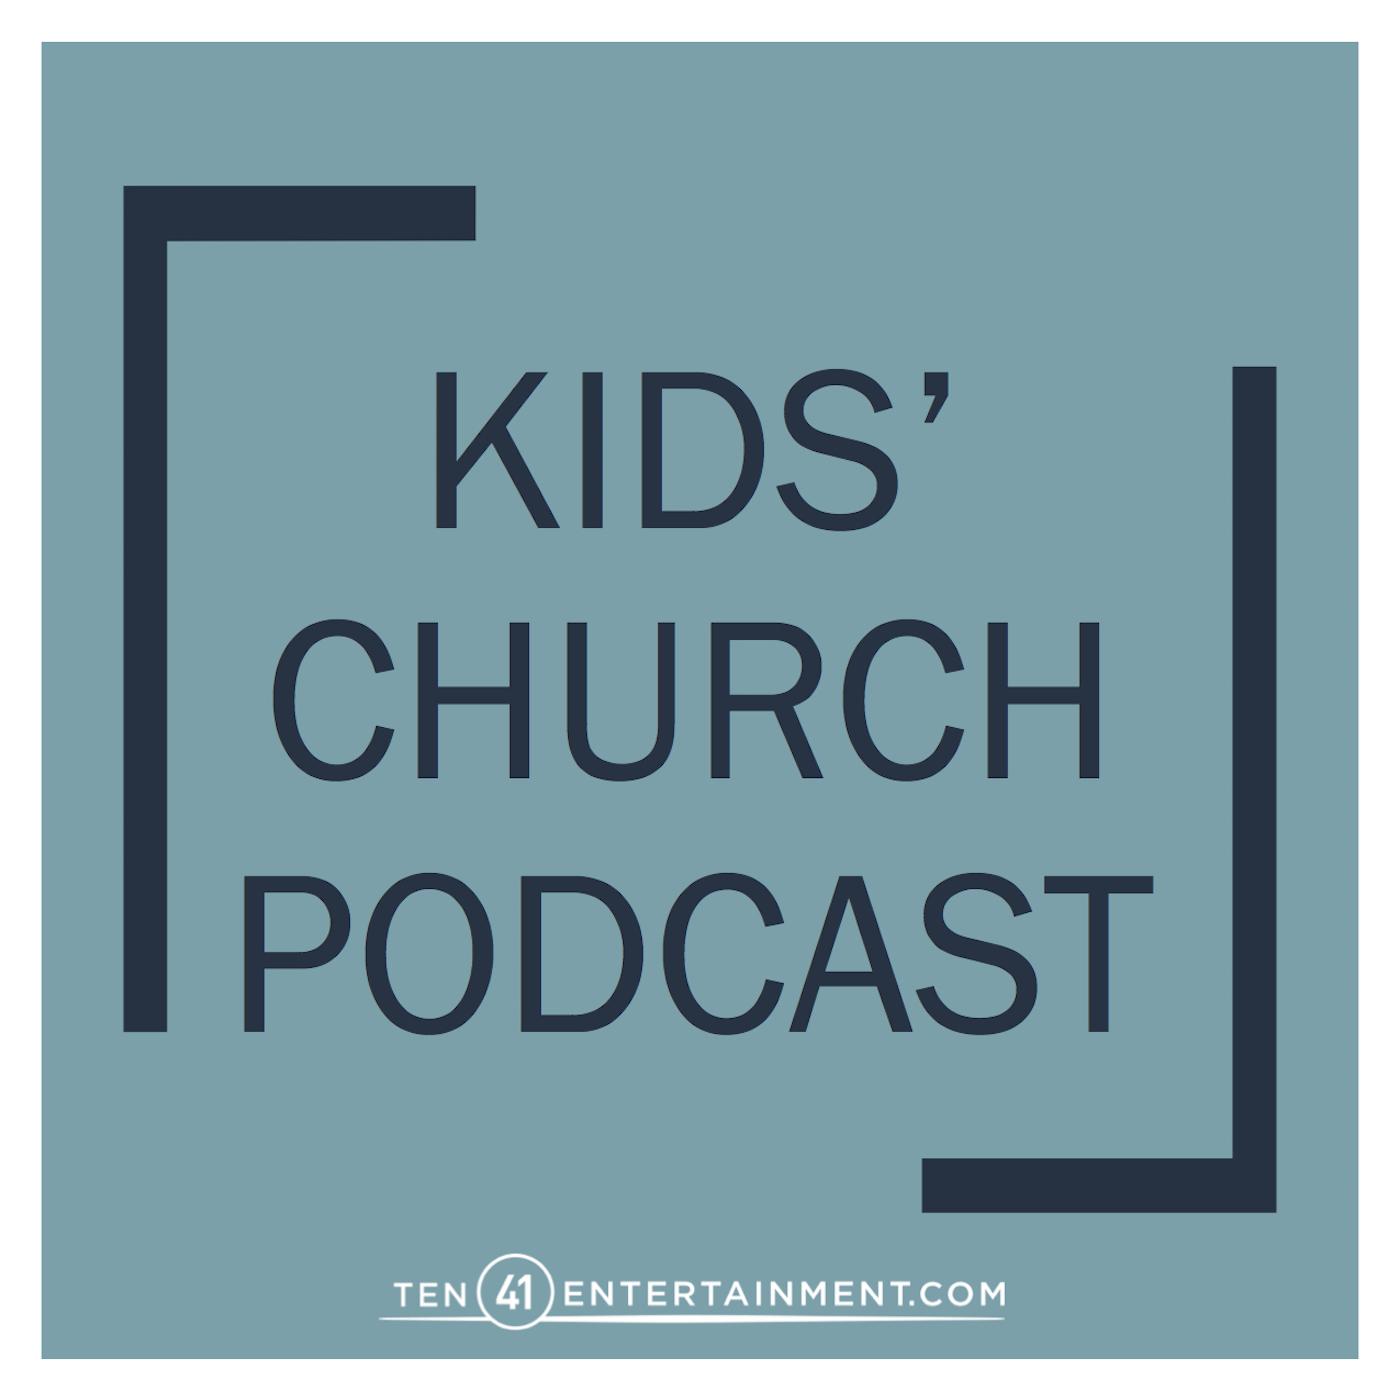 Kids' Church Podcast